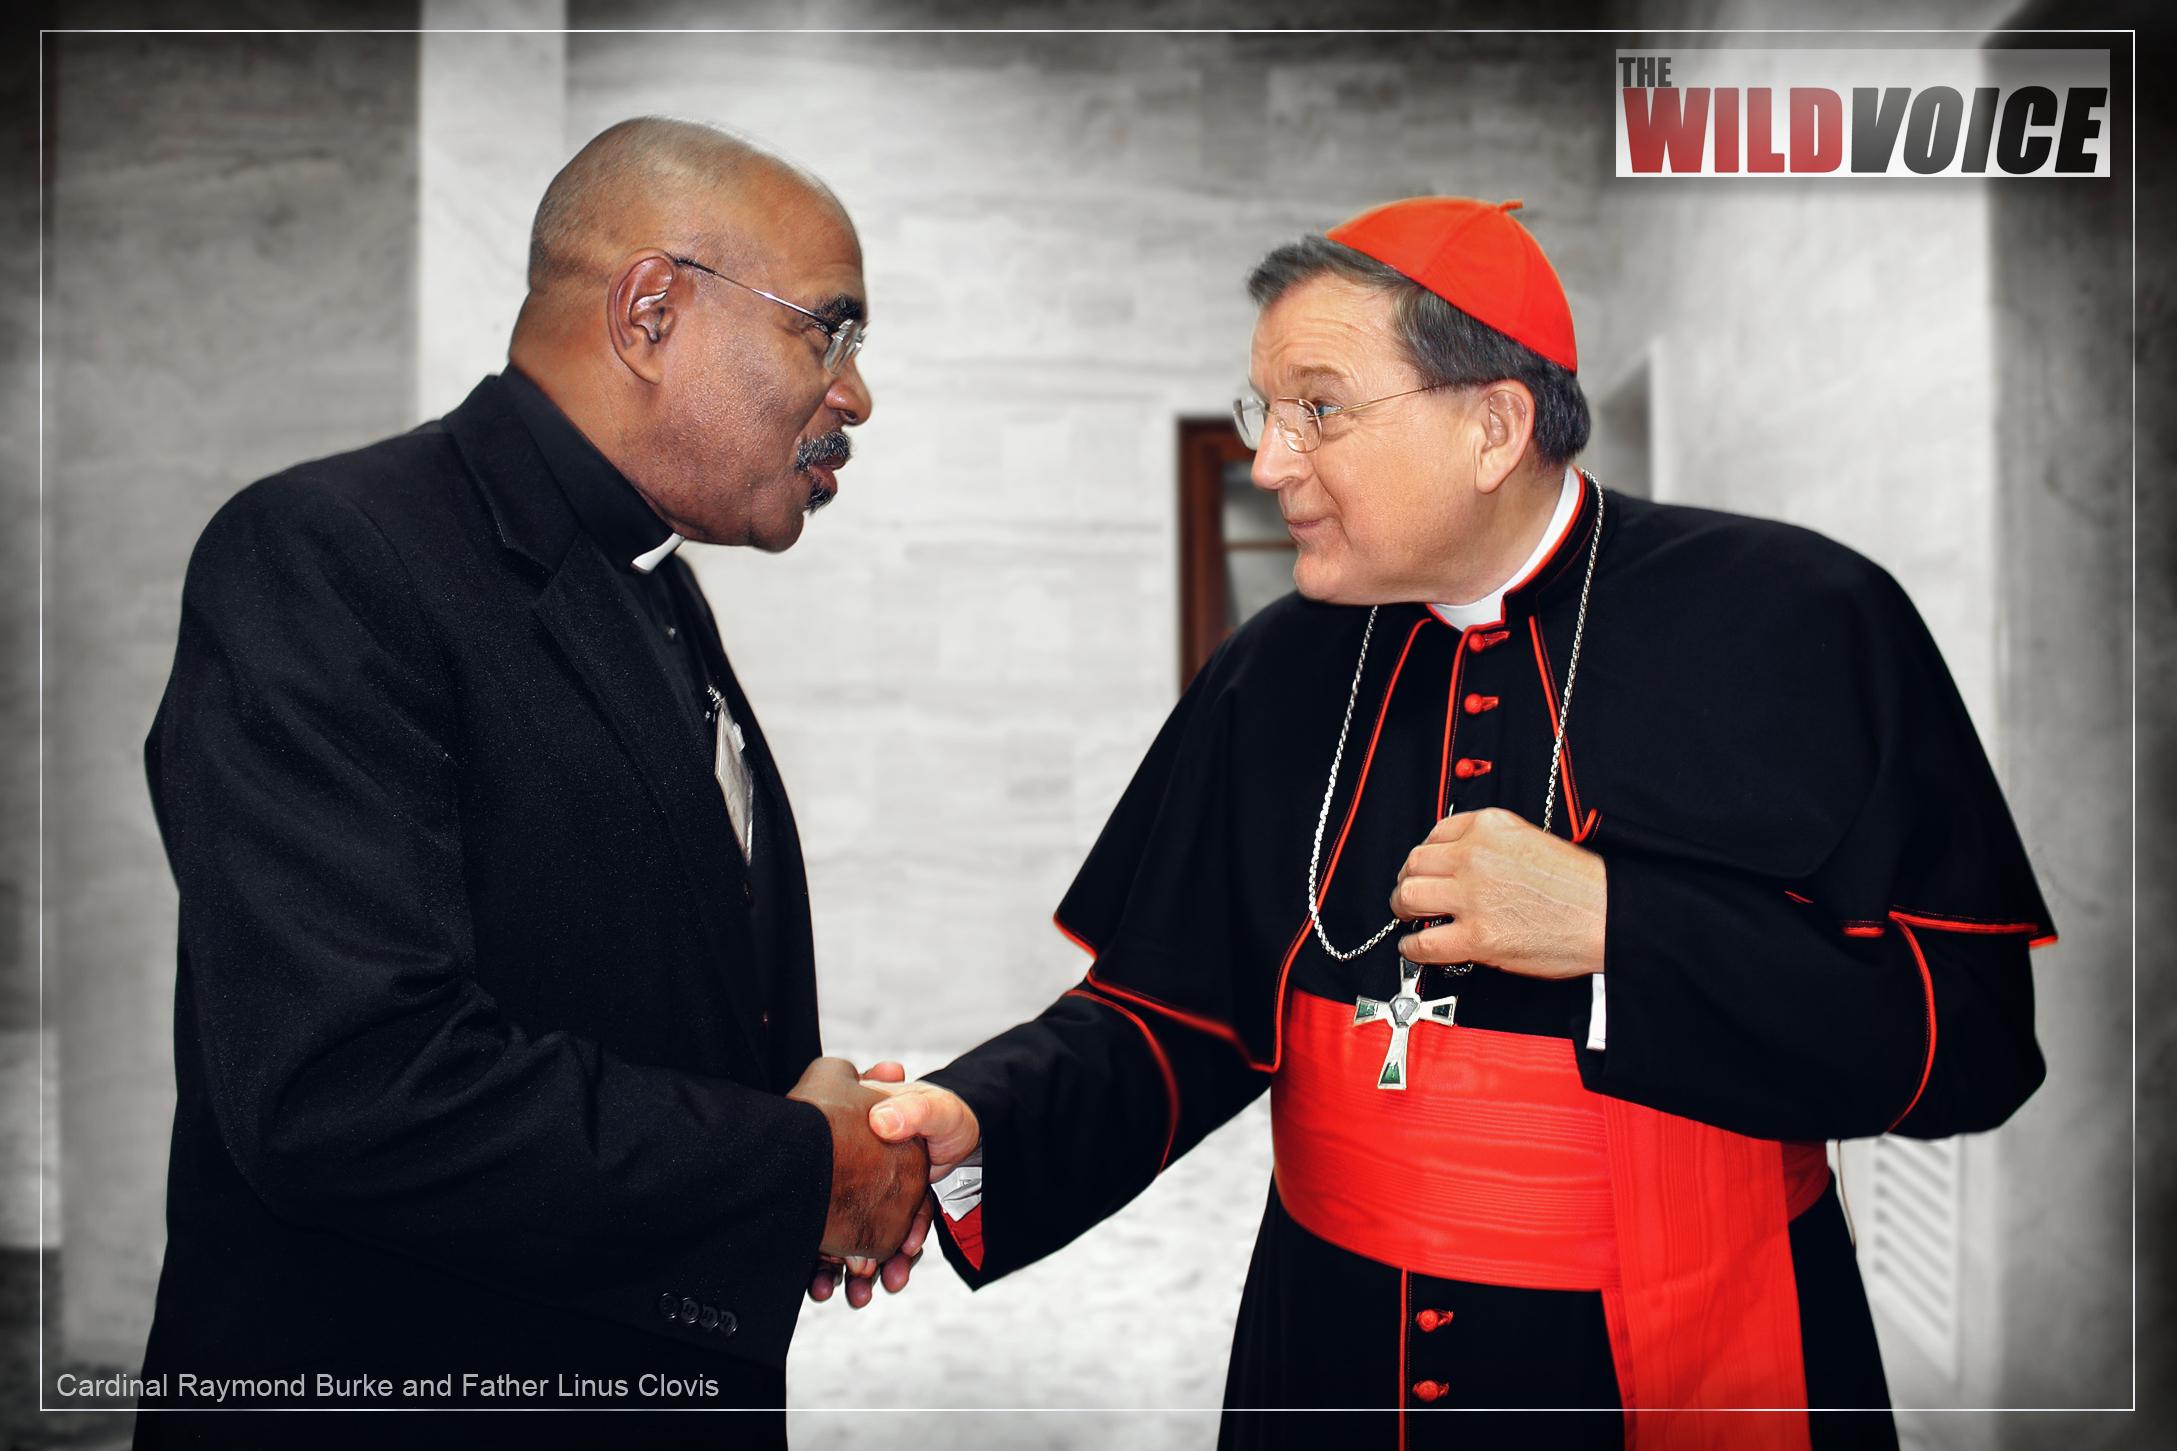 Cardinal, Raymond Burke, Father, Linus Clovis, truth, slander, lies, defamation, pope francis, false prophet, wild voice, bergoglio, catholic, church, francis effect